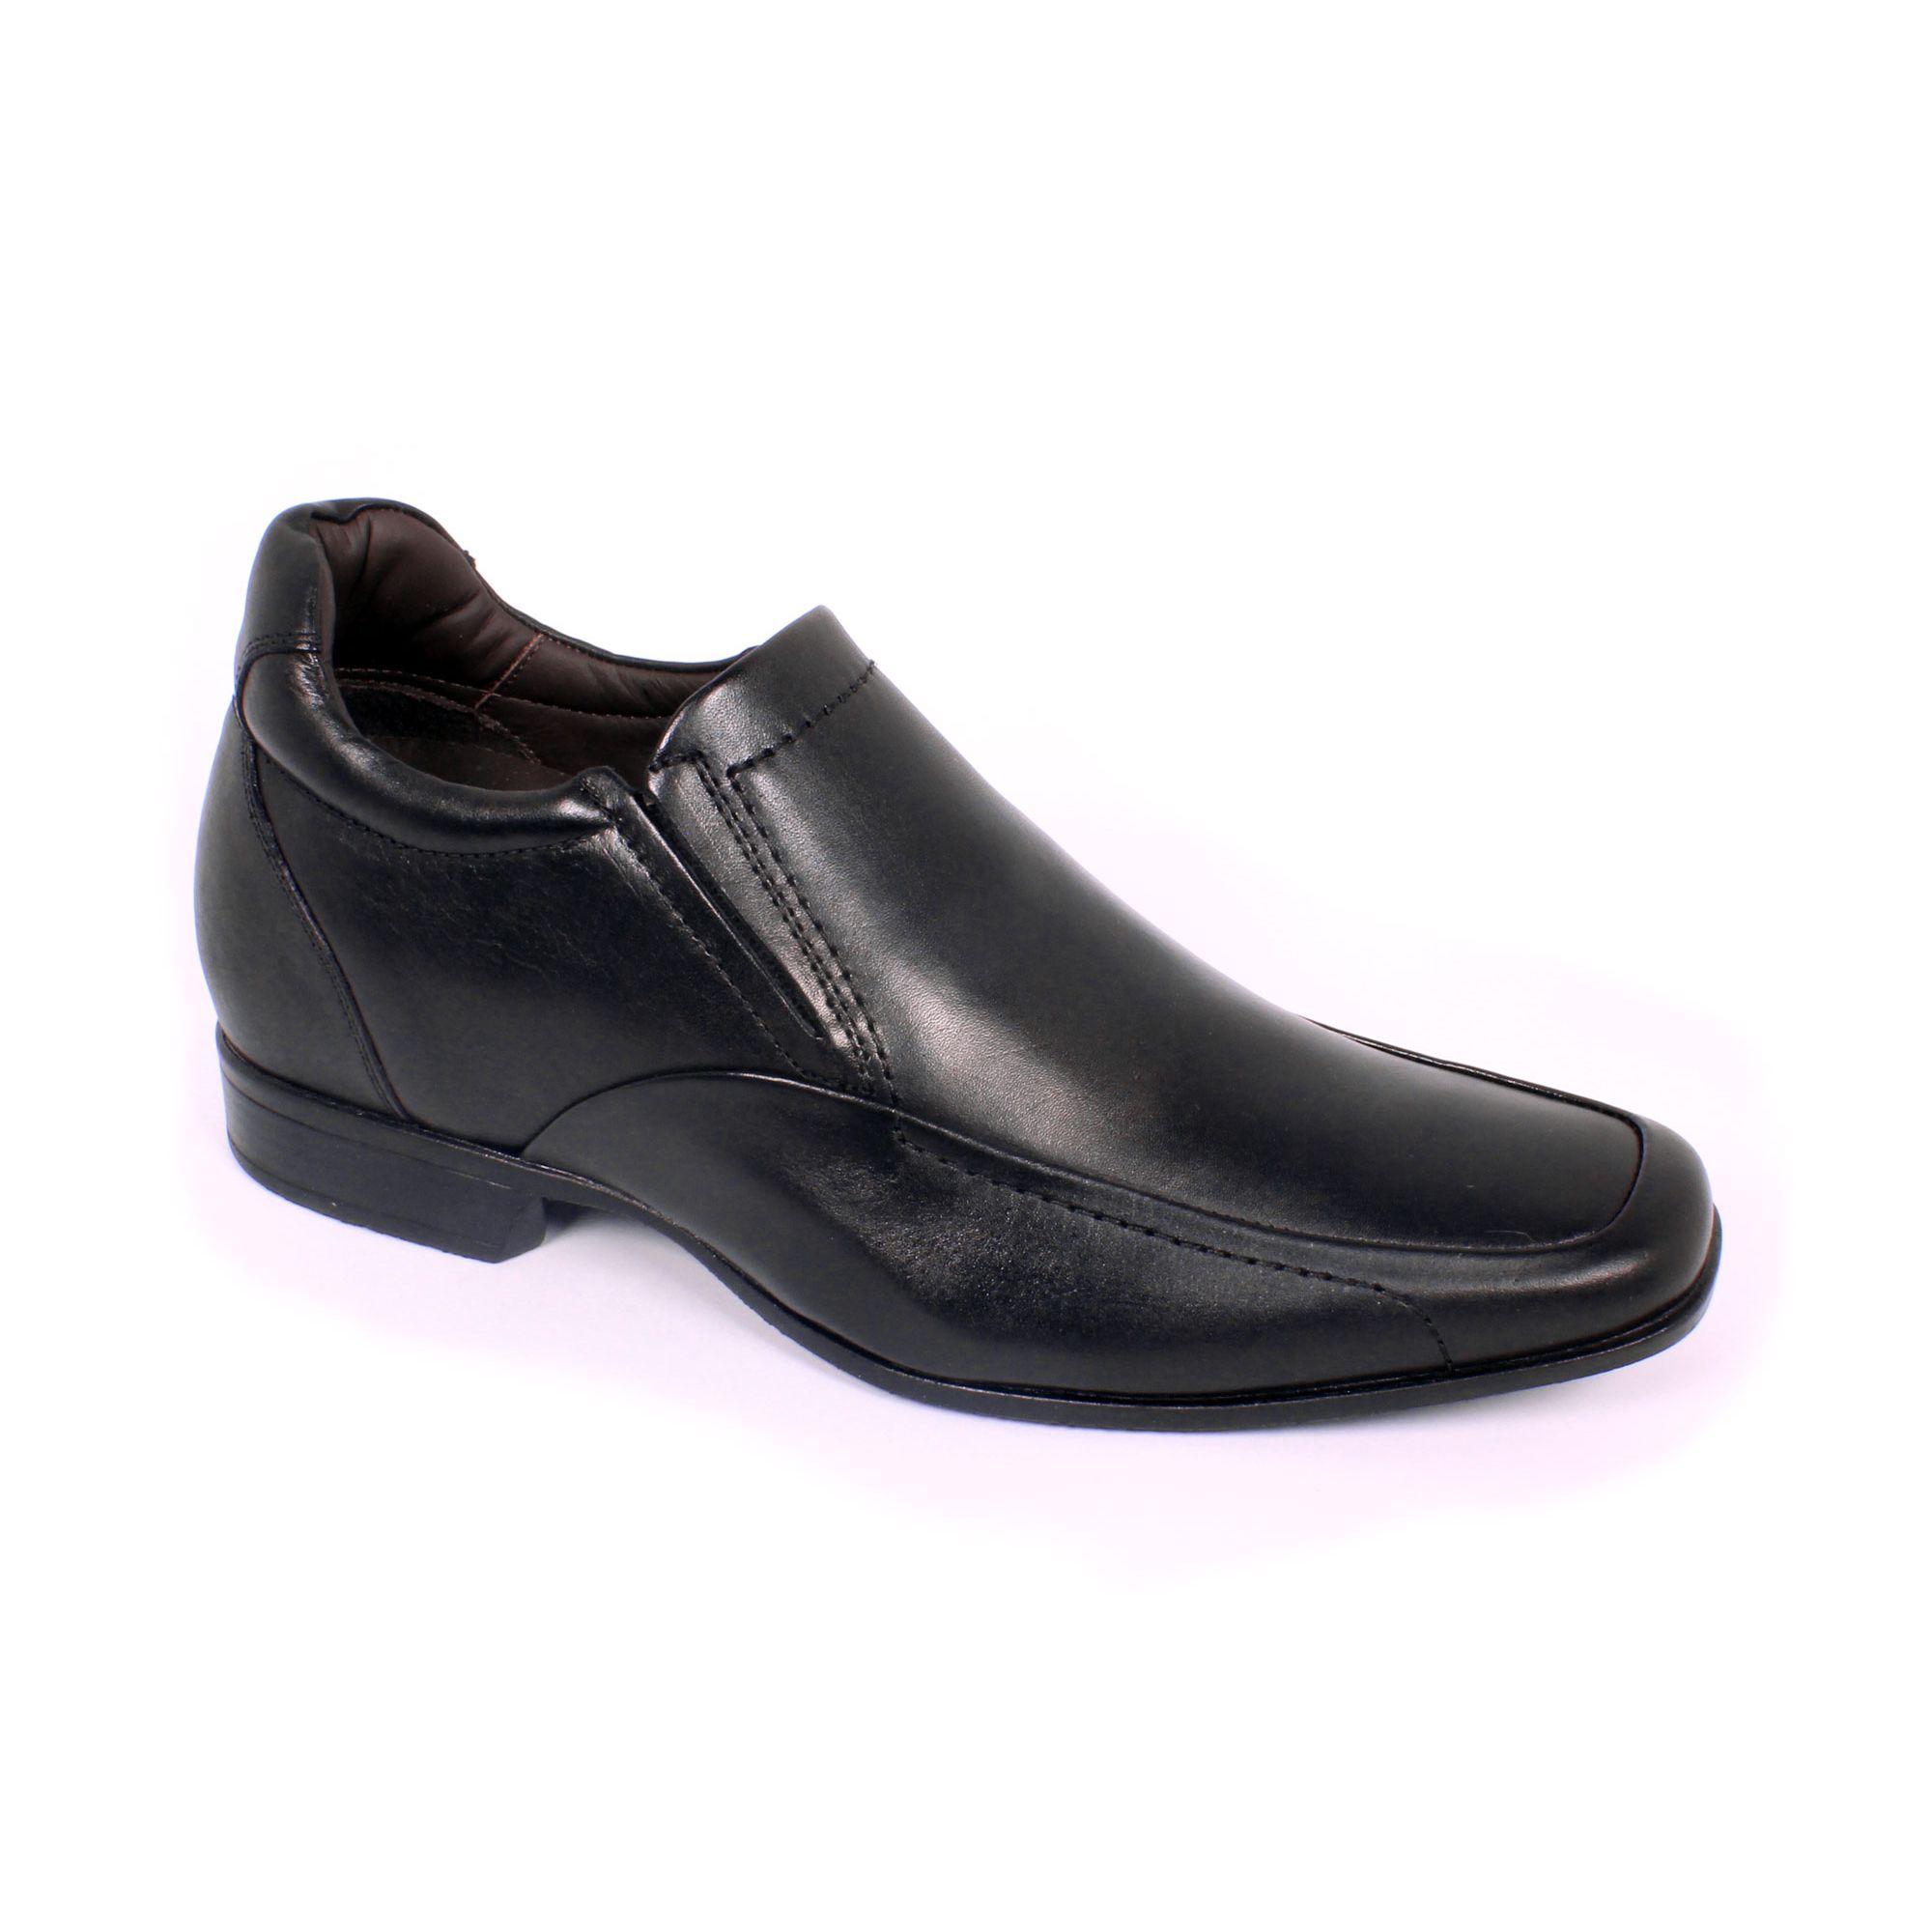 Zapato Formal Tabaco Negro Max Denegri +7cms de Altura_70841